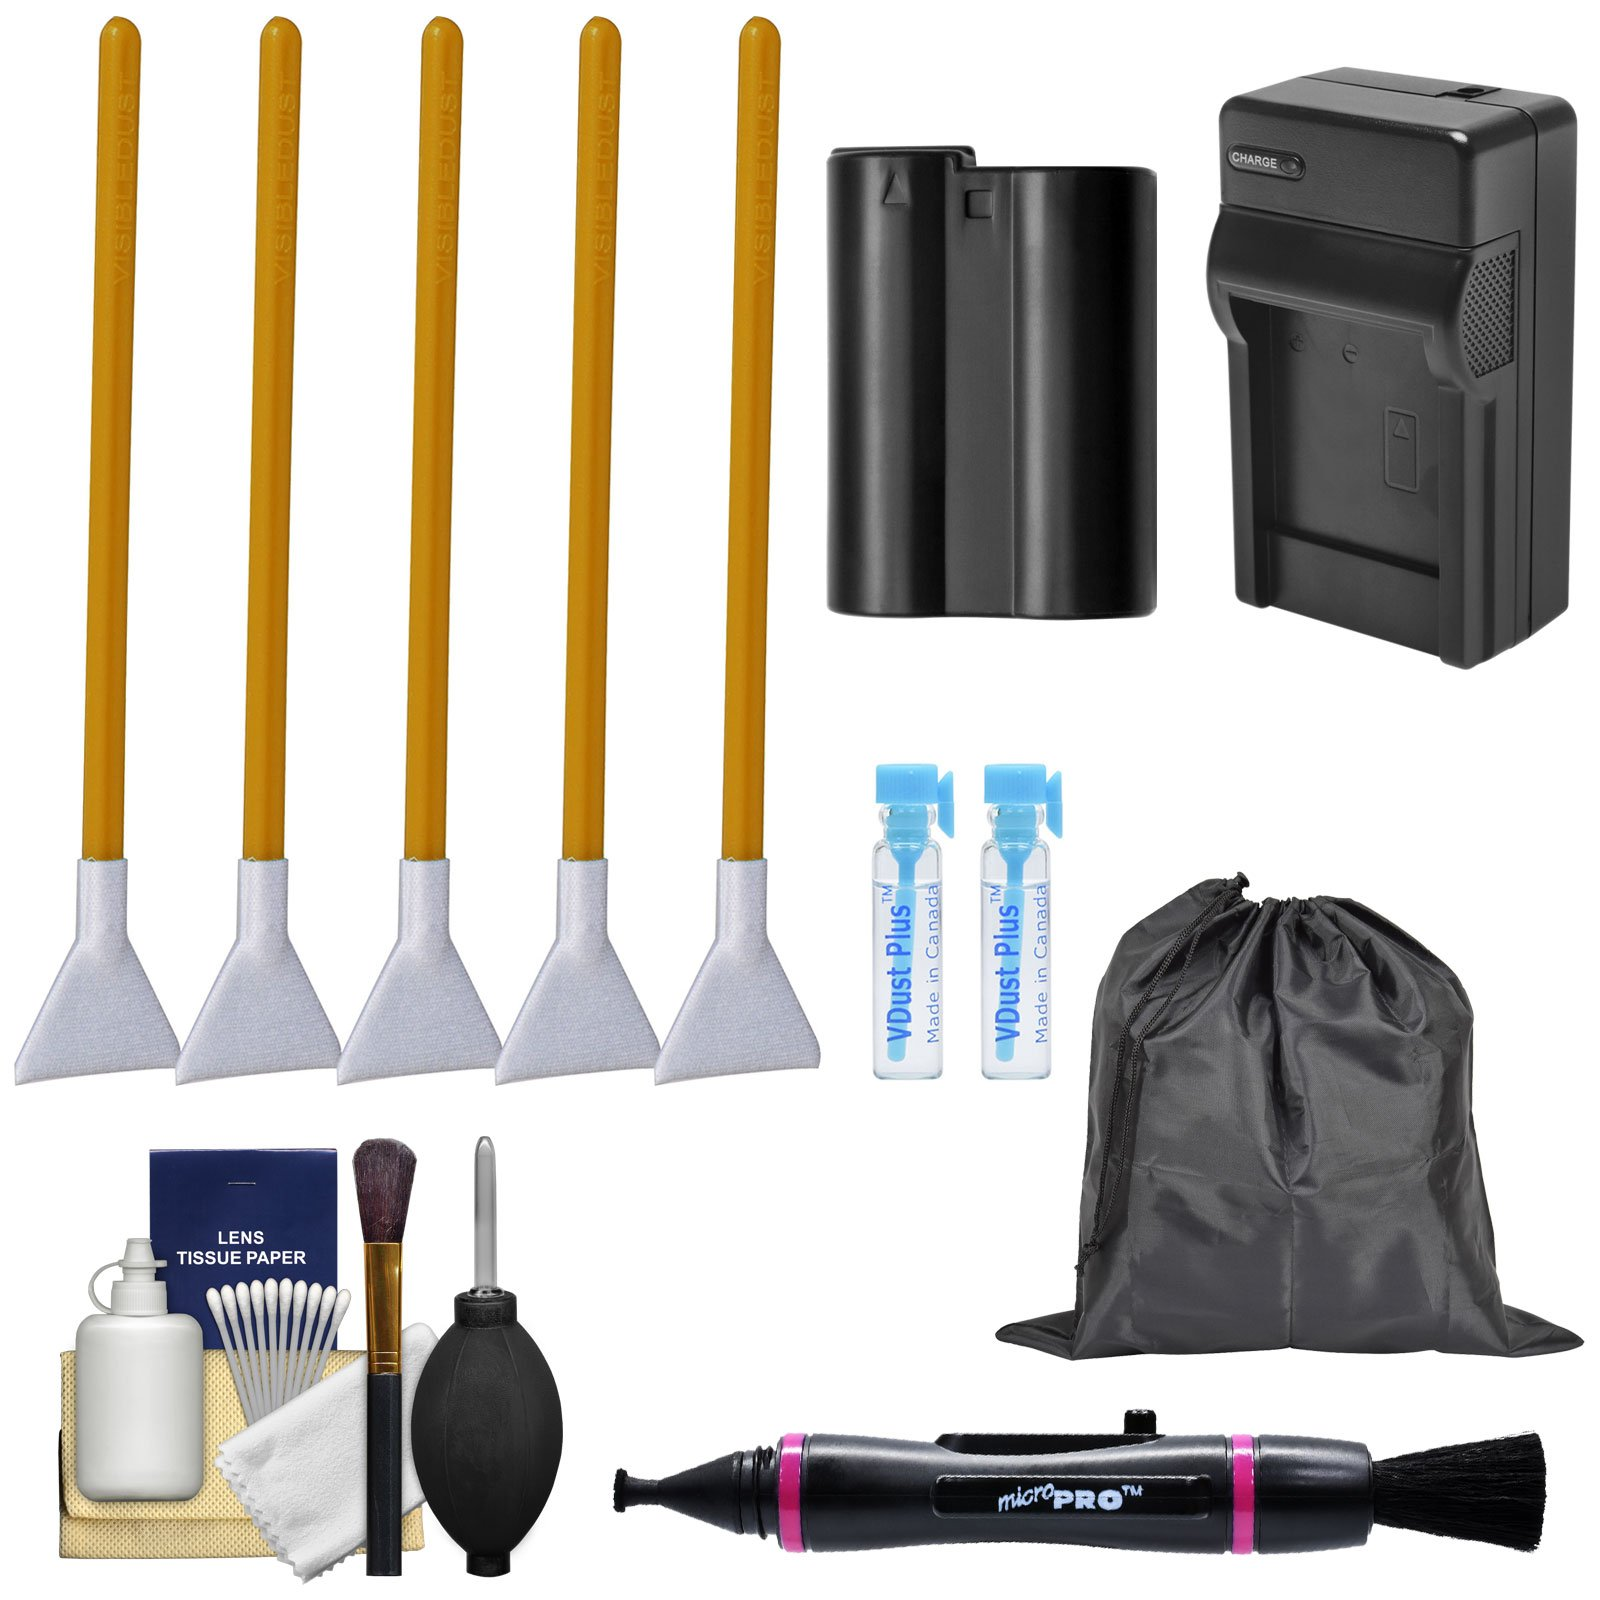 Essential Bundle Sensor Cleaning Kit with EN-EL15 Battery & Charger Bundle for Nikon D7100, D7200, D7500, D500 DSLR Cameras